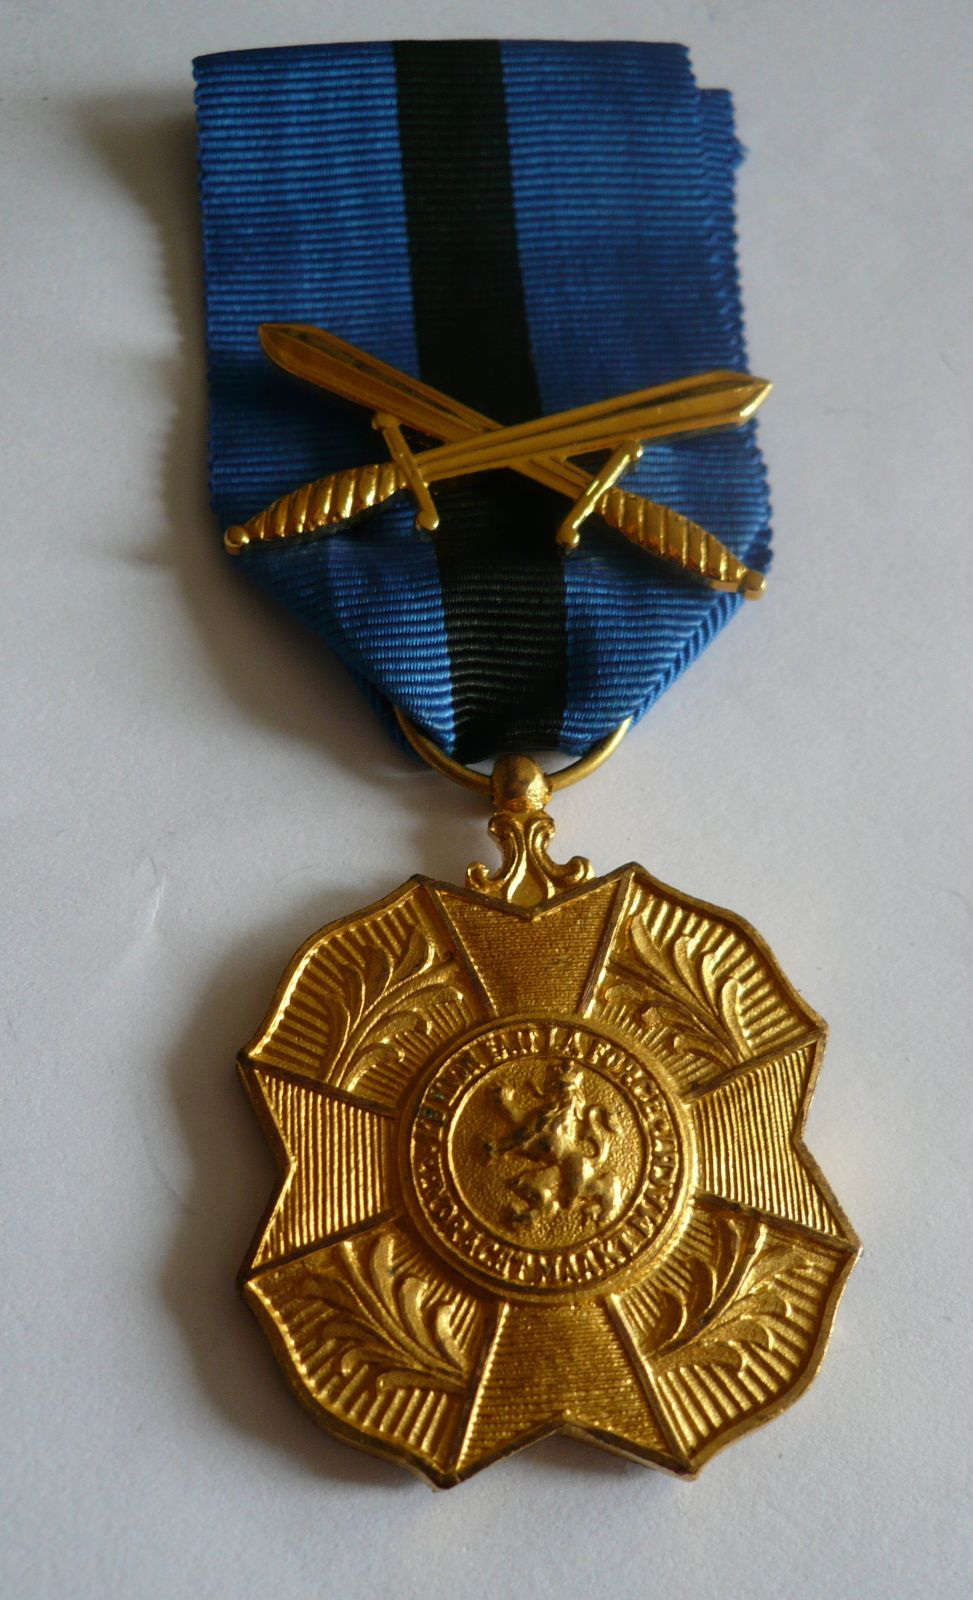 záslužná medaile s meči, Belgie